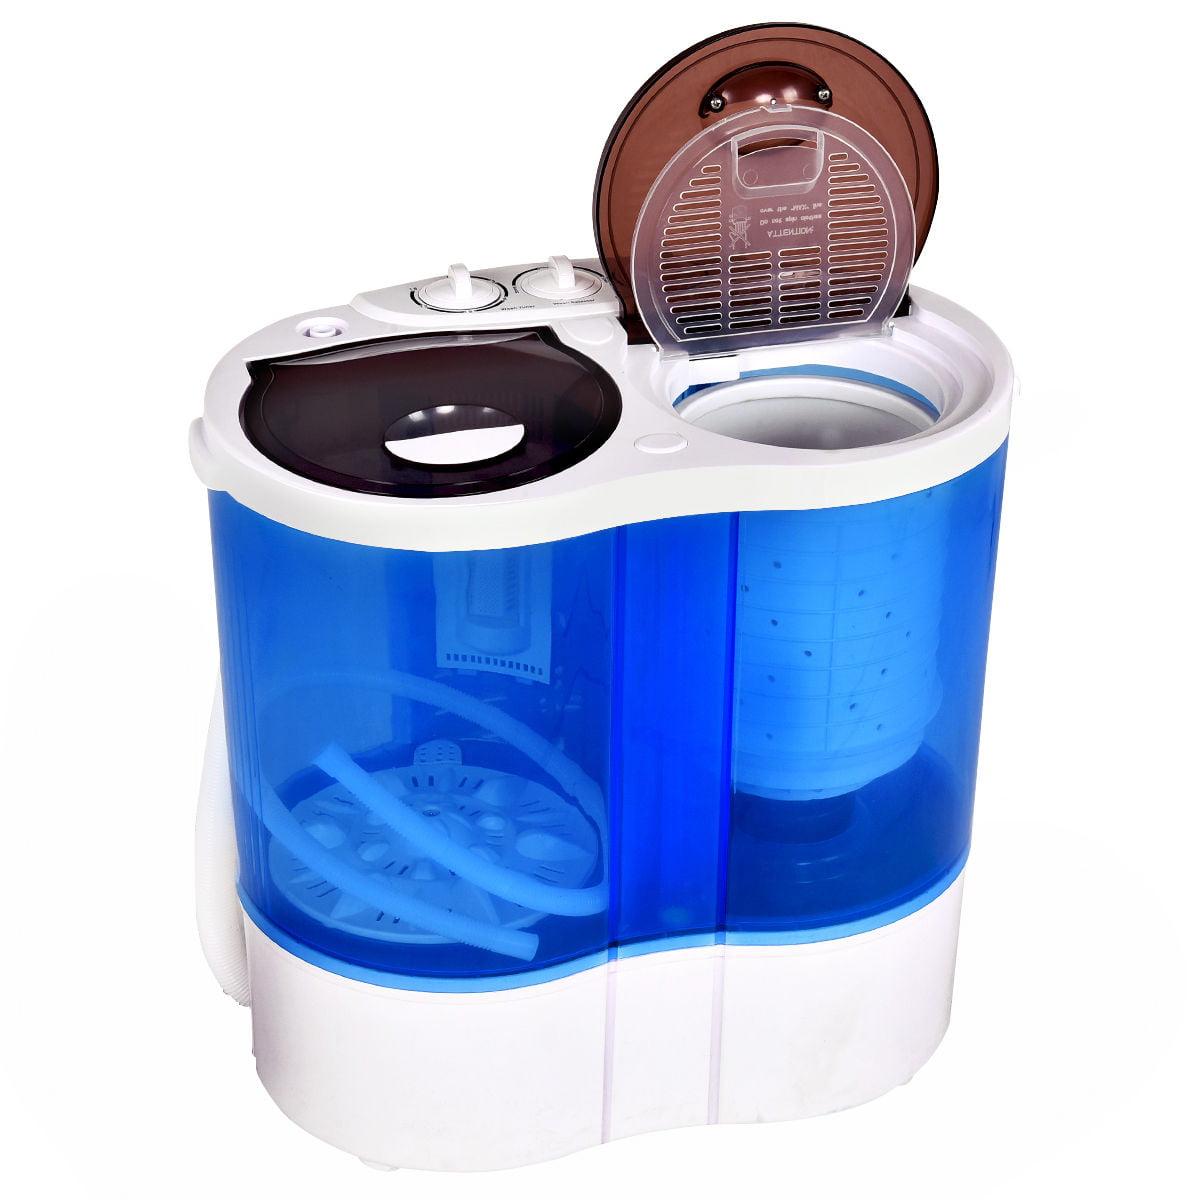 Costway Portable Mini Washing Machine Compact Twin Tub 15lb Washer ...